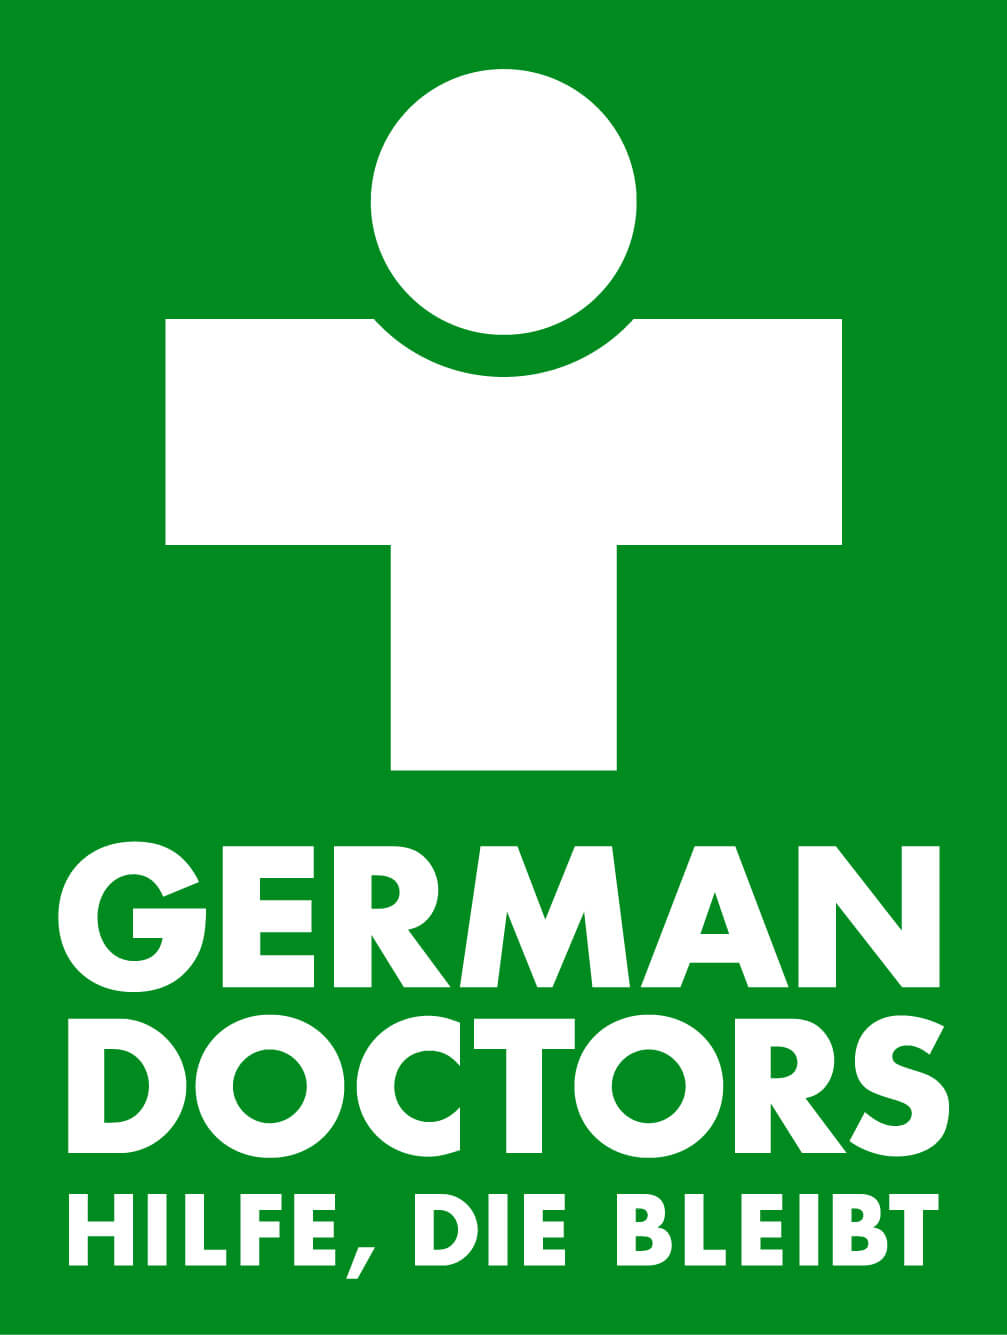 German Doctors - Partner 7summits4help